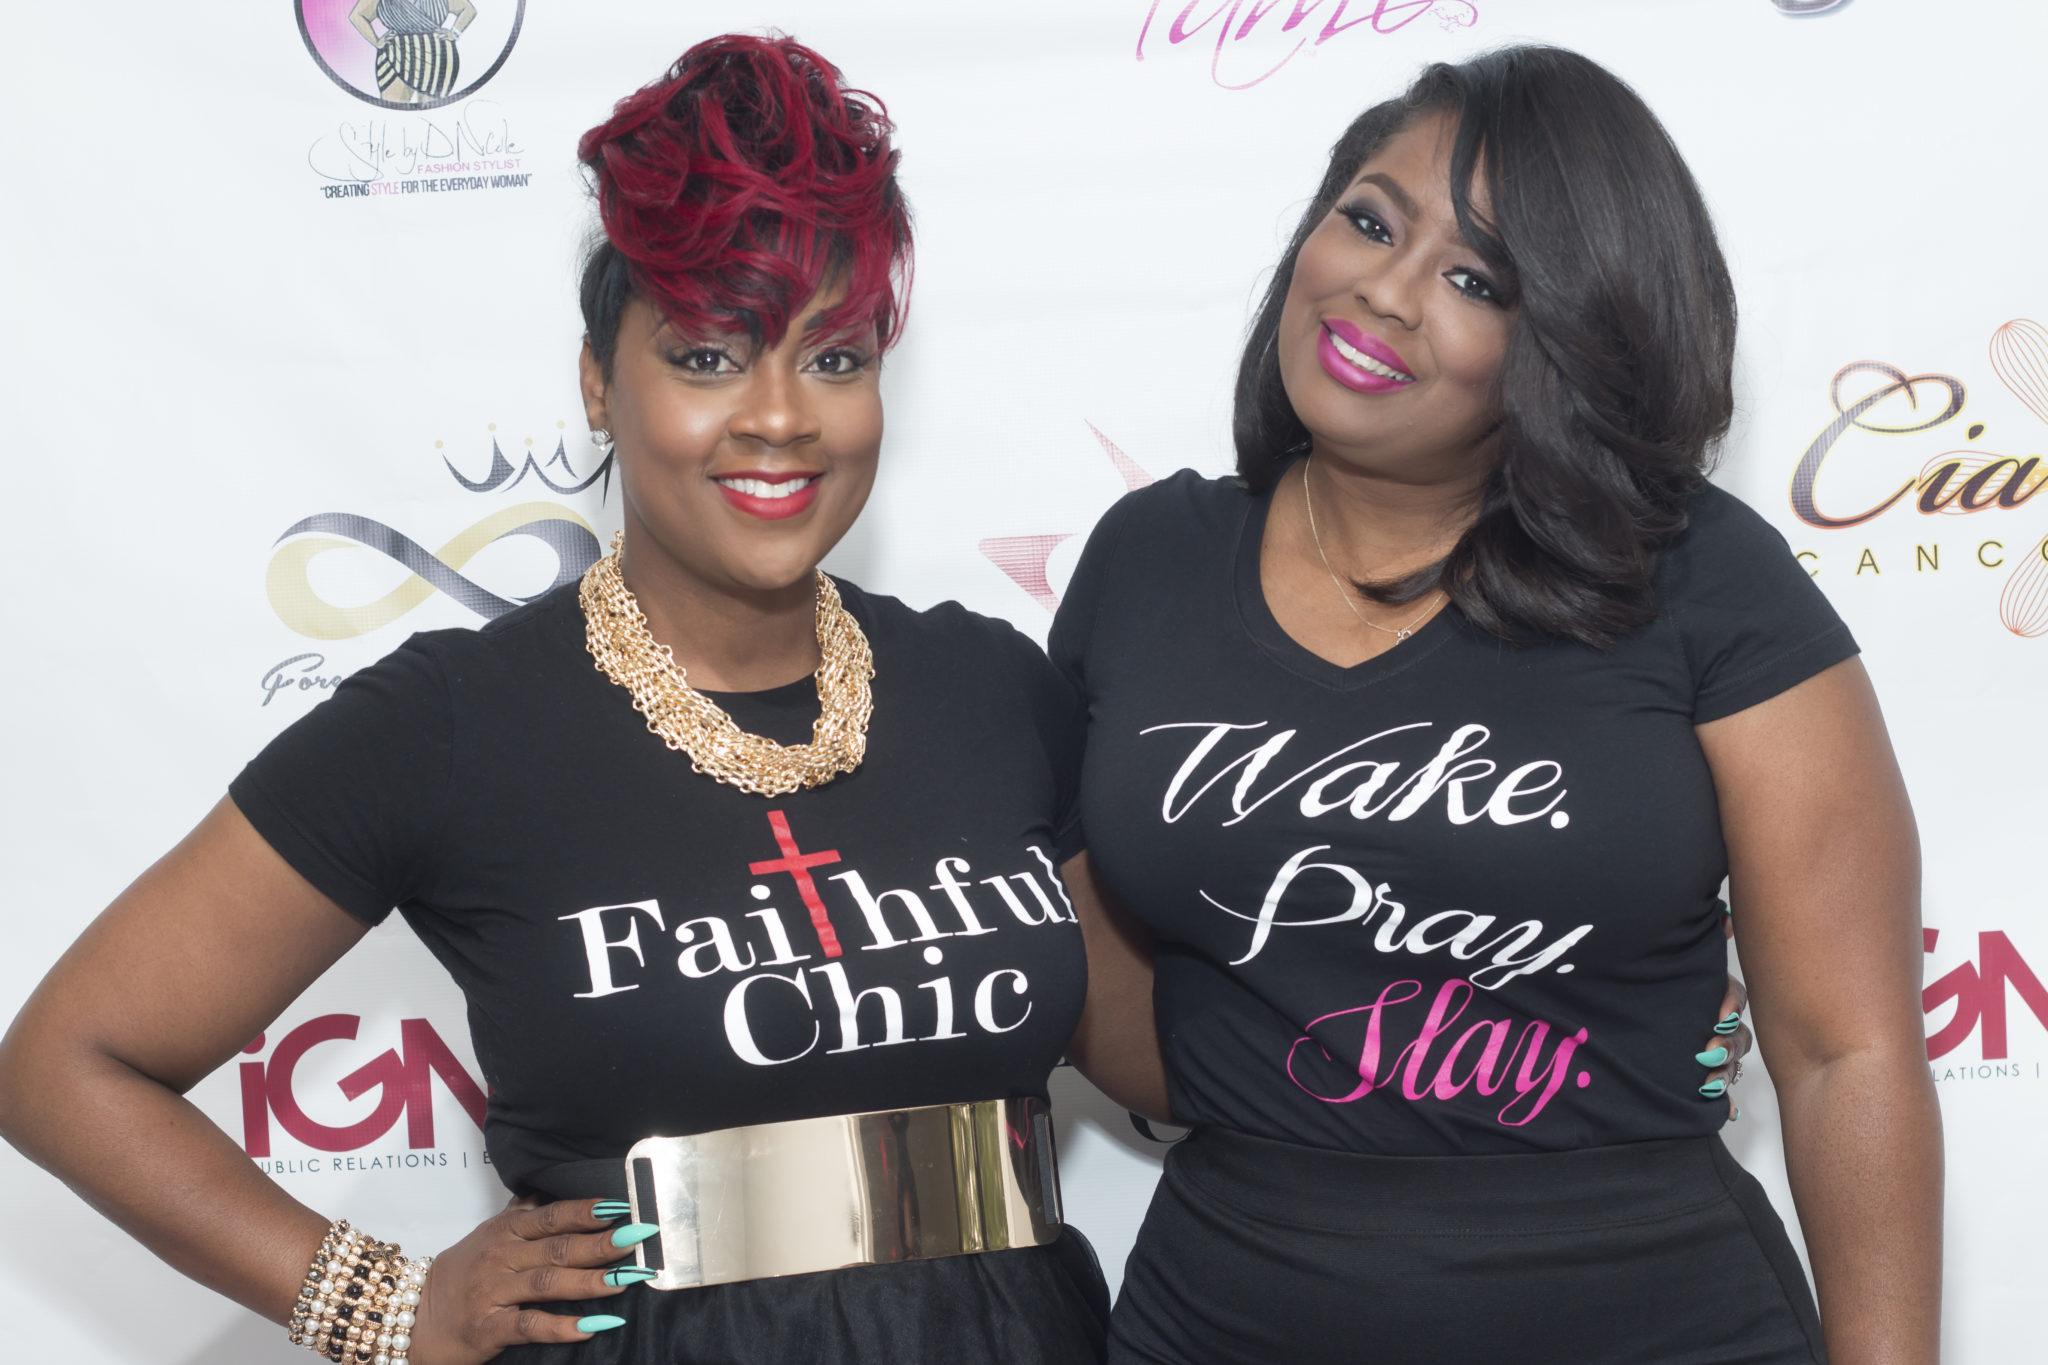 Recap: Faithful Chics Pop Up Shop